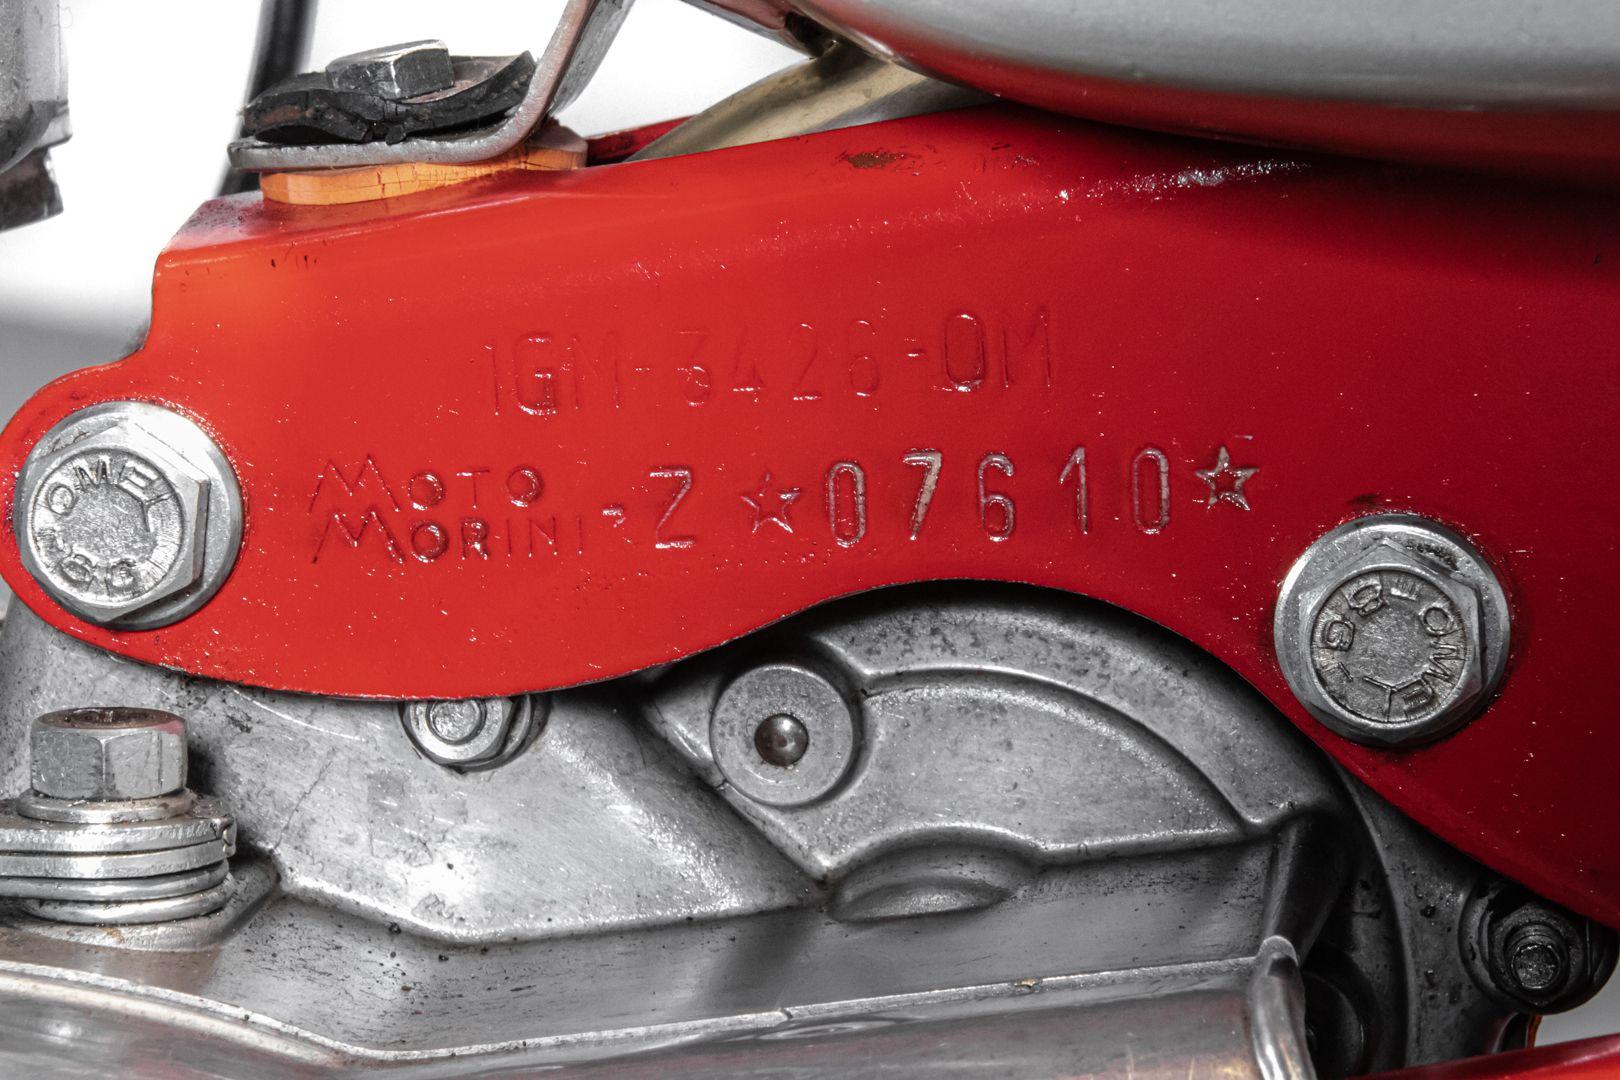 1965 Moto Morini Corsarino Z 77576